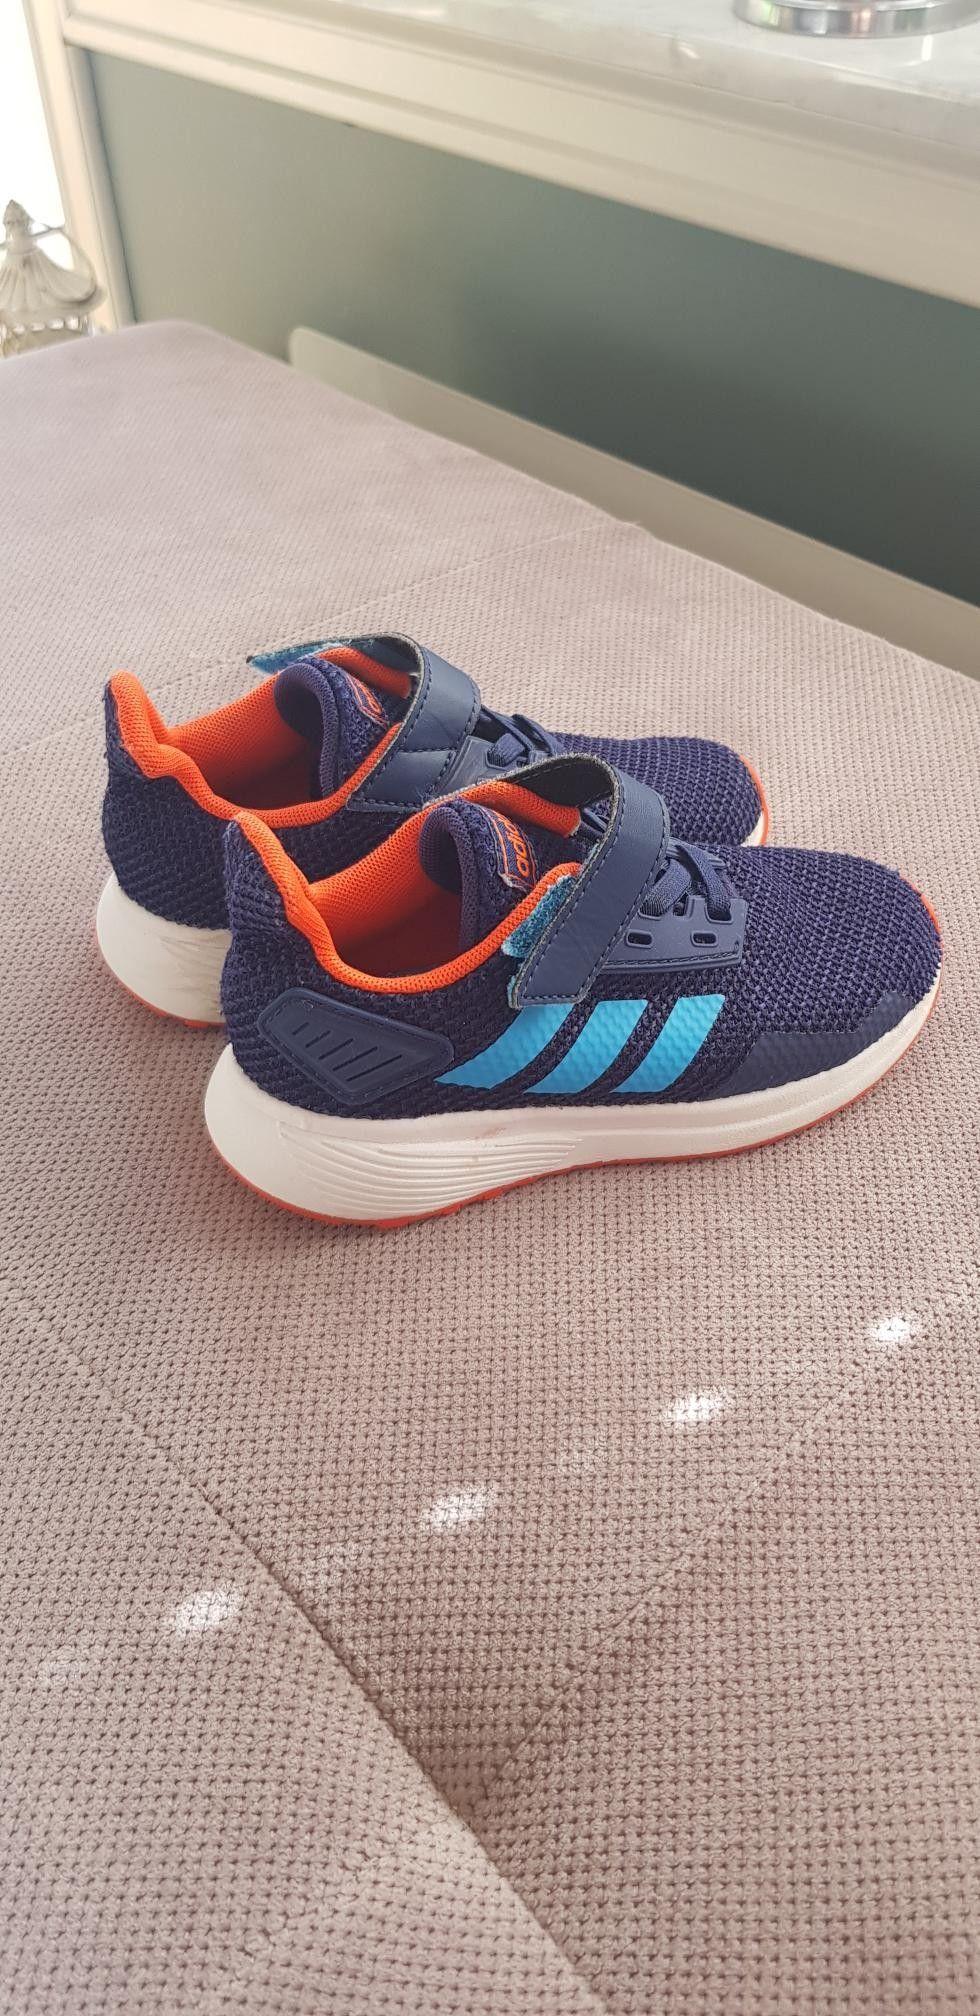 Adidas sko str 33 | FINN.no